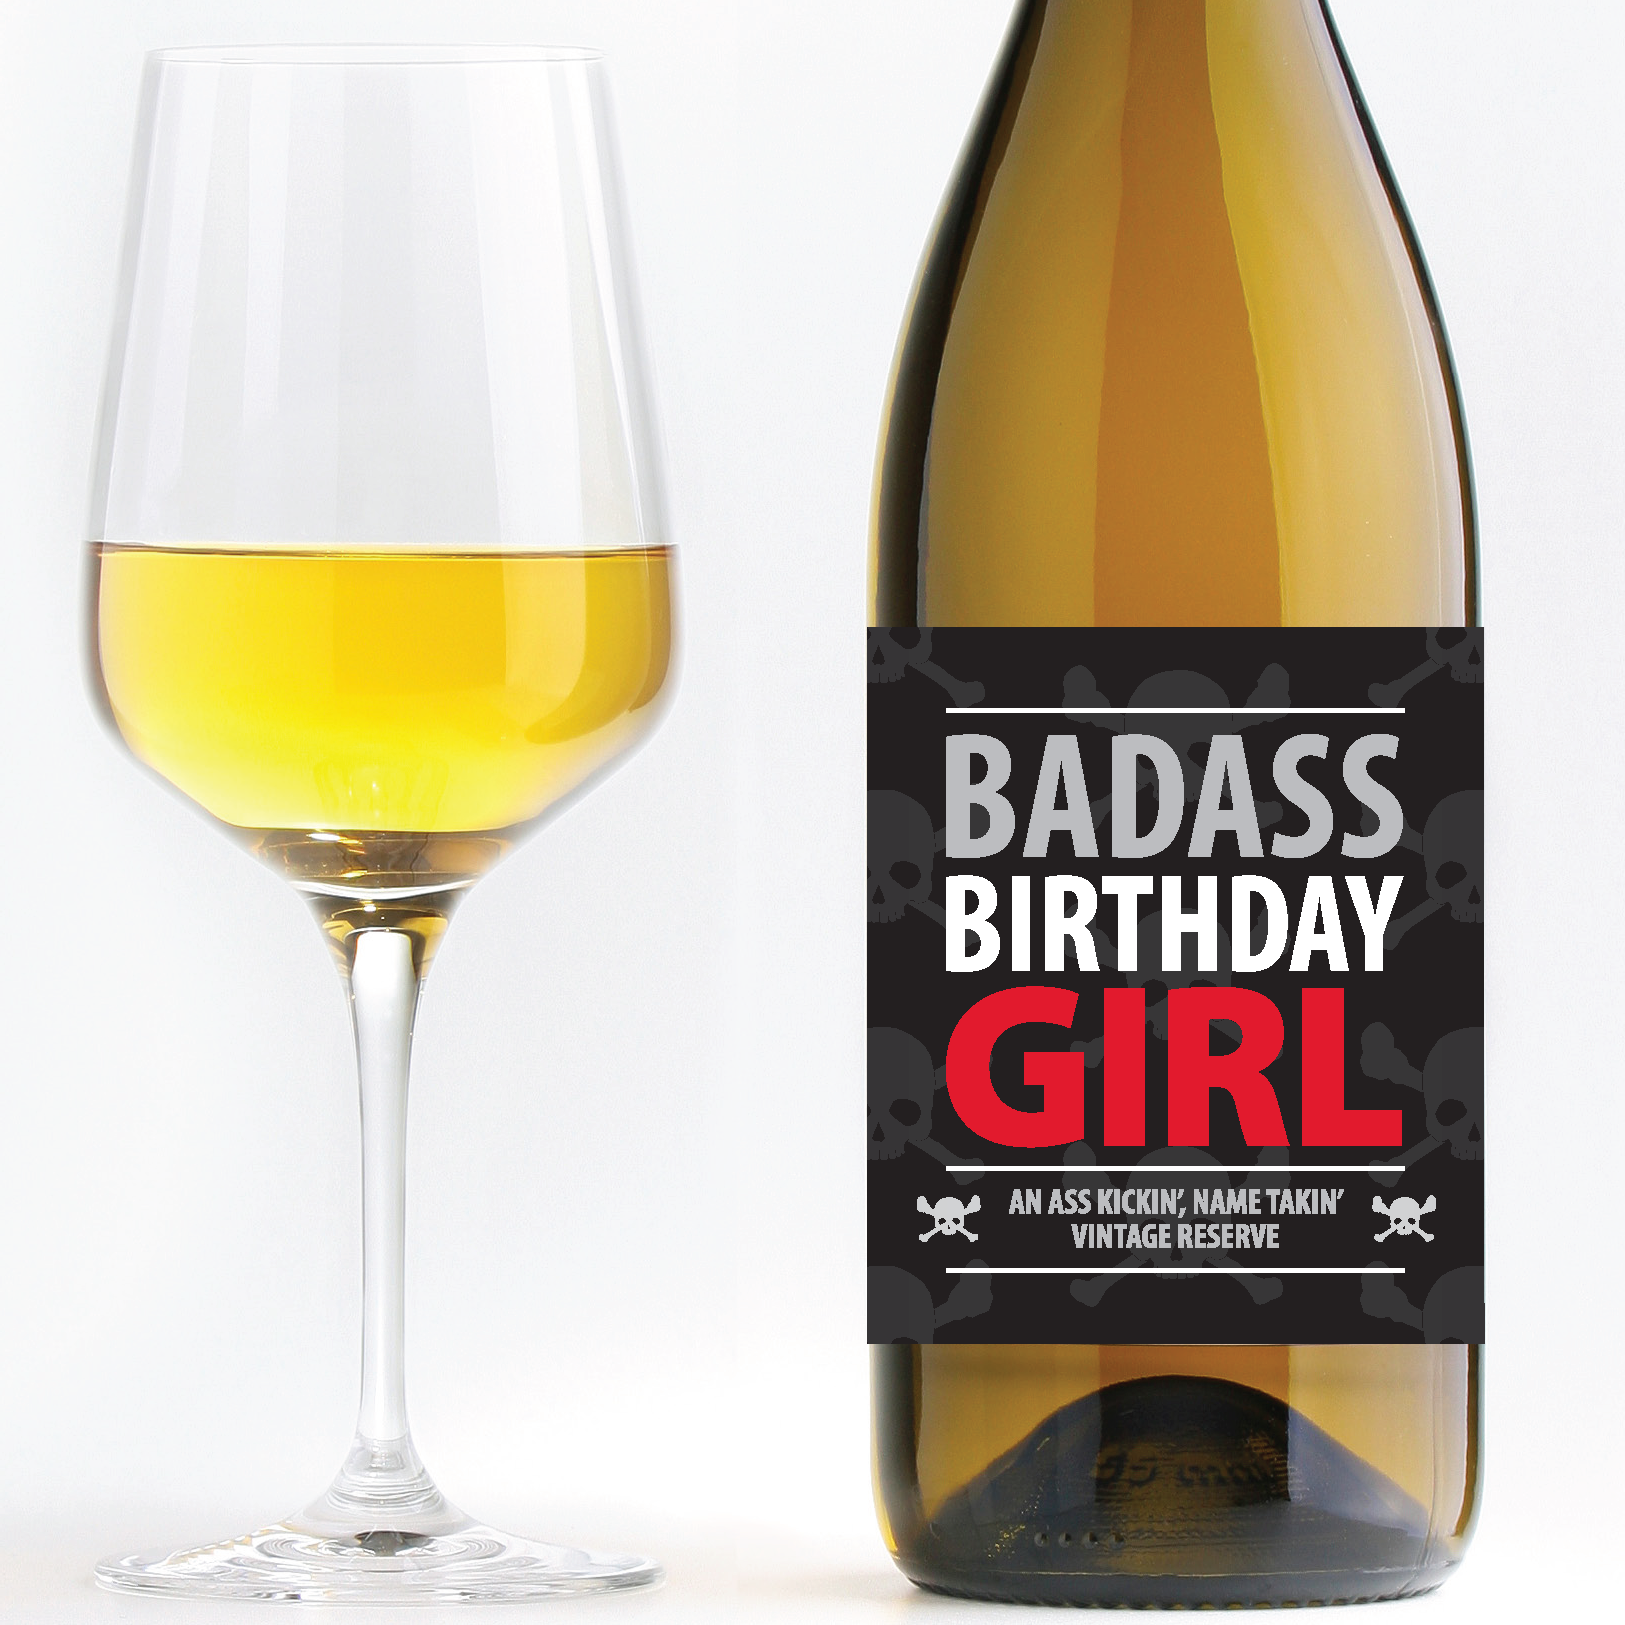 Badass Birthday Girl u2013 Birthday Wine PlusPng.com  - Birthday Wine PNG